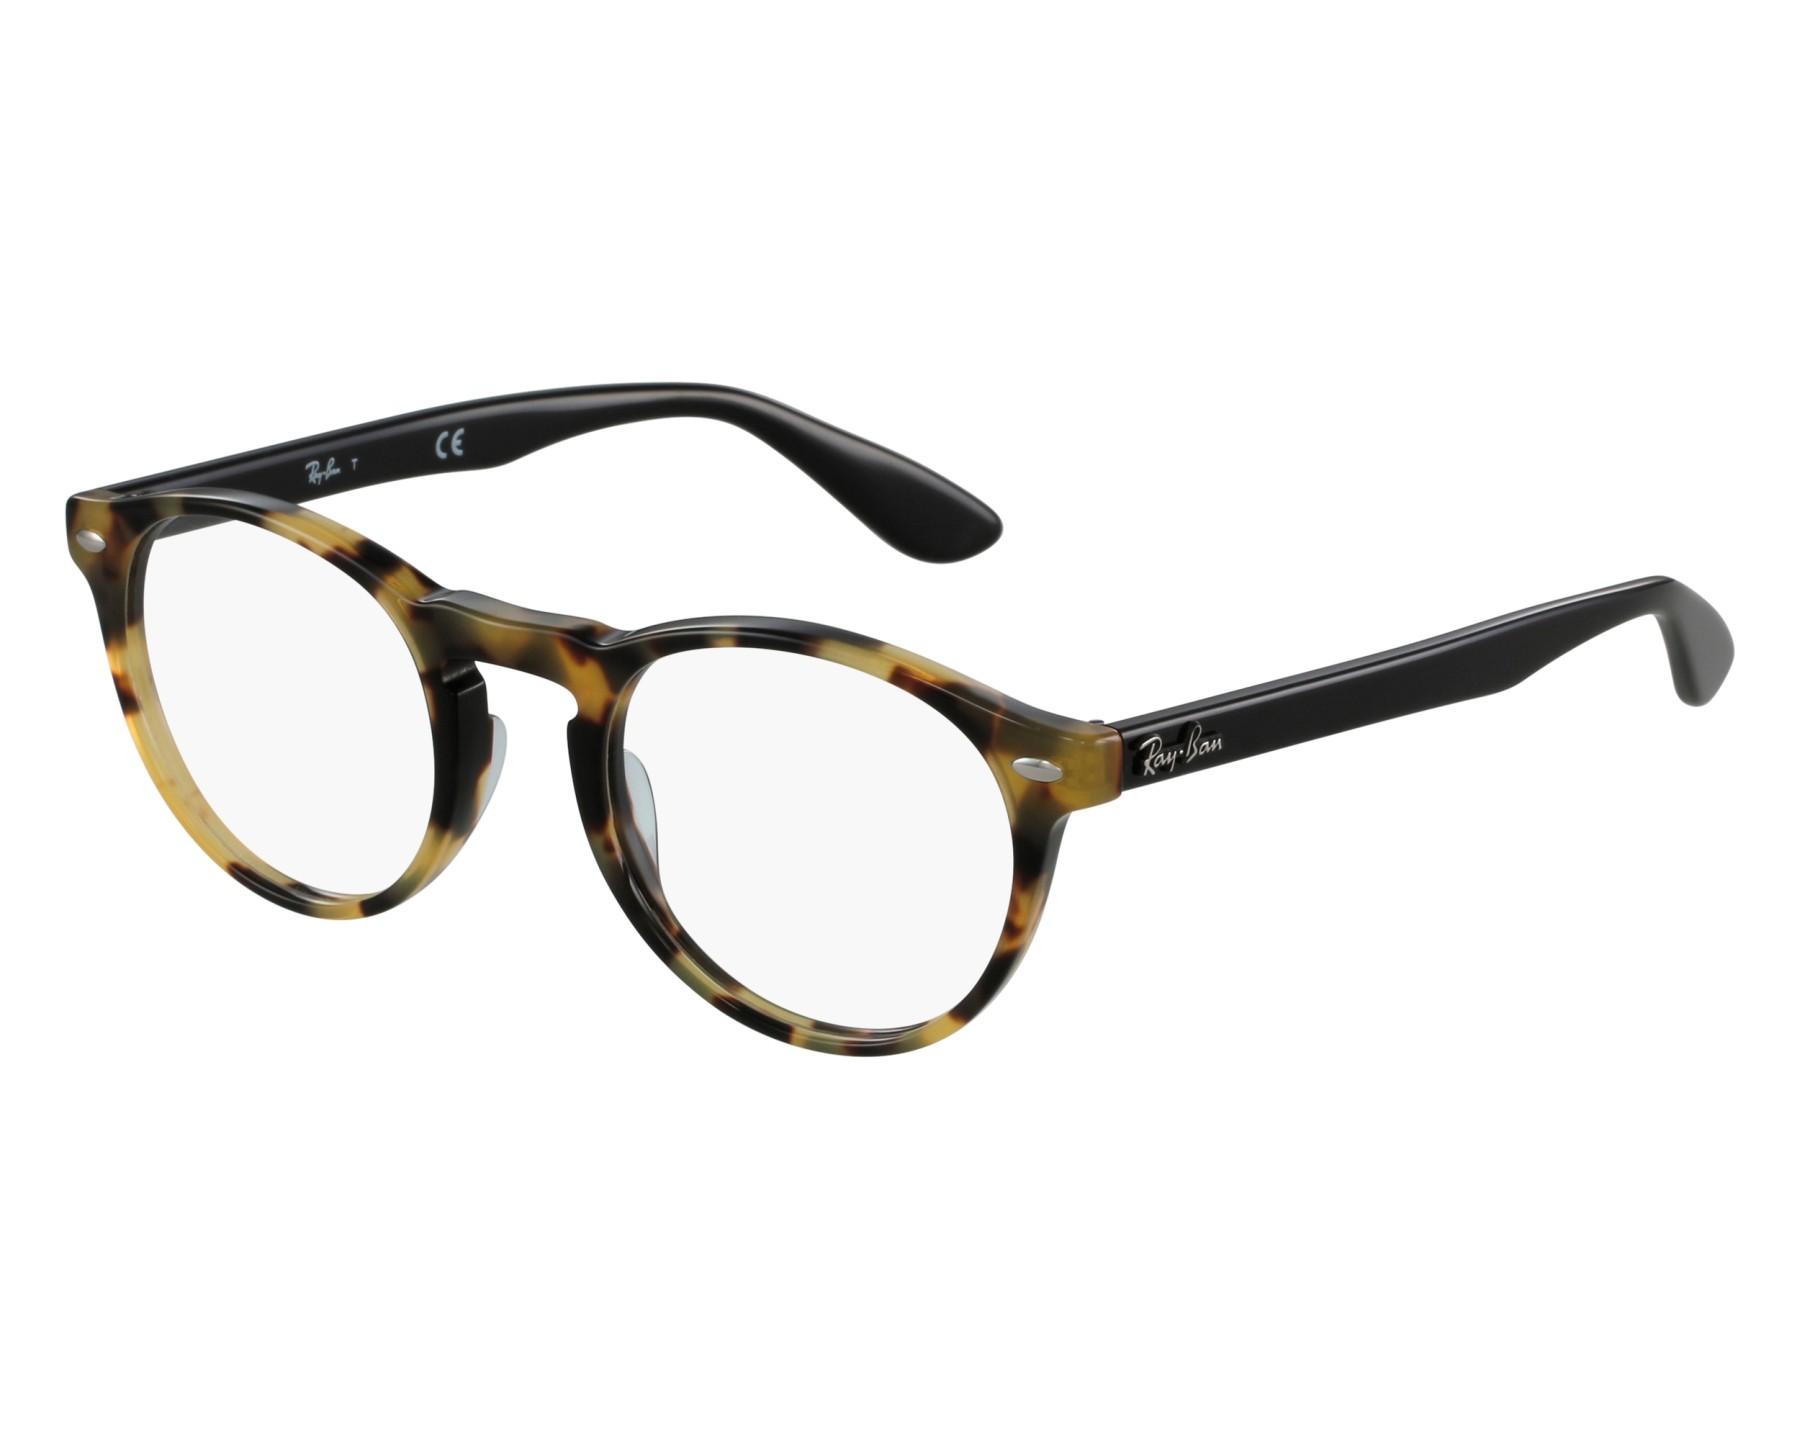 2d9f60ee42 Gafas Graduadas Ray-Ban RX-5283 5608 49-21 Havana Miel Negra vista